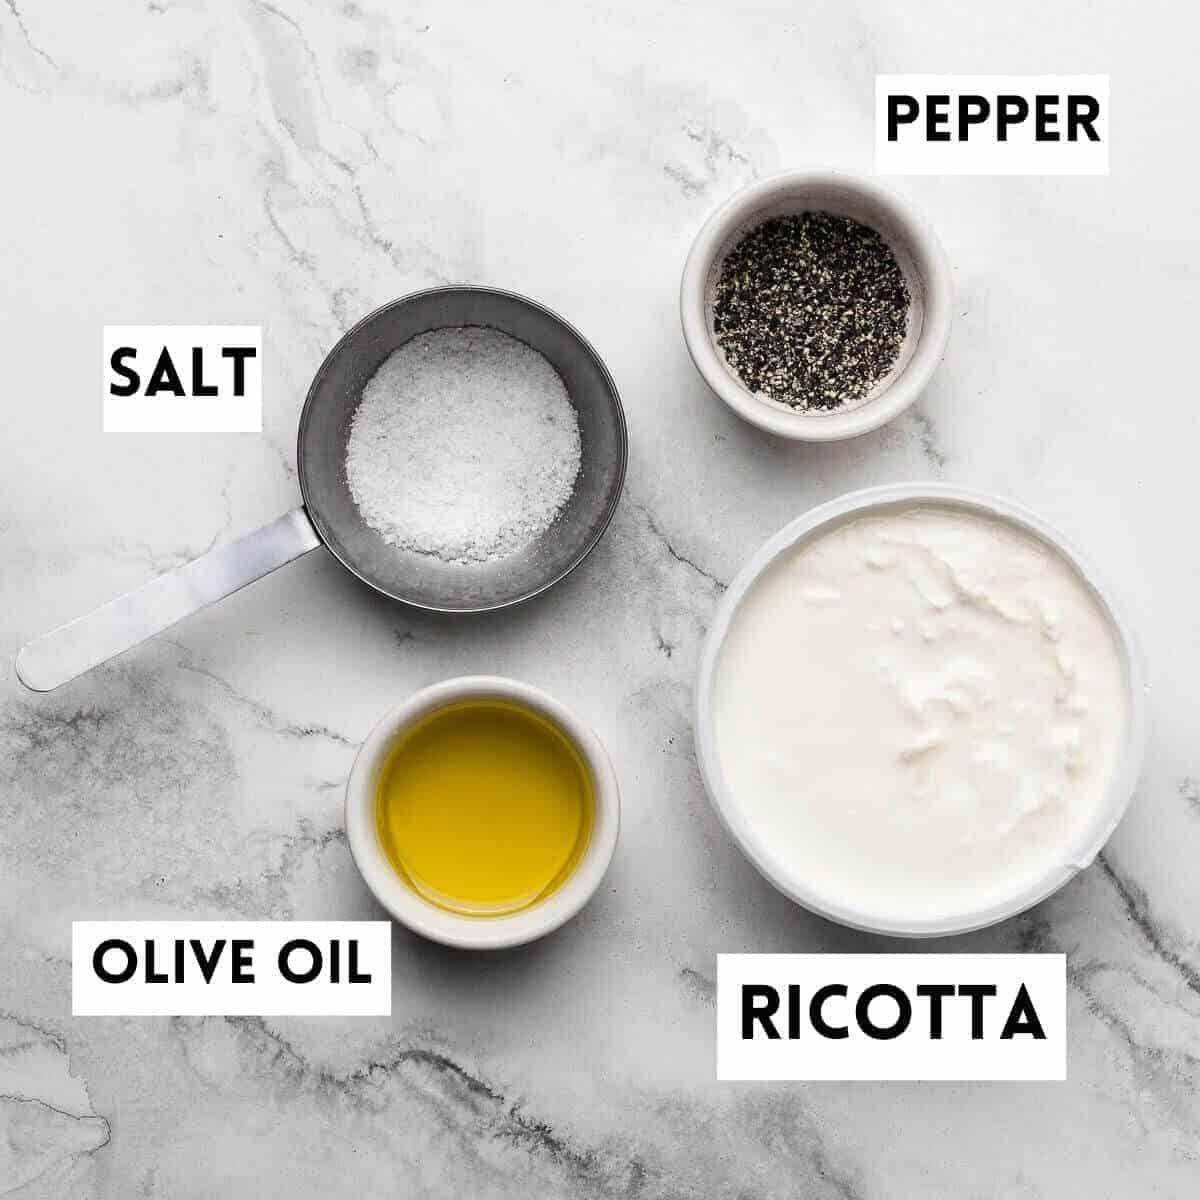 olive oil,salt,pepper and ricotta on marble background